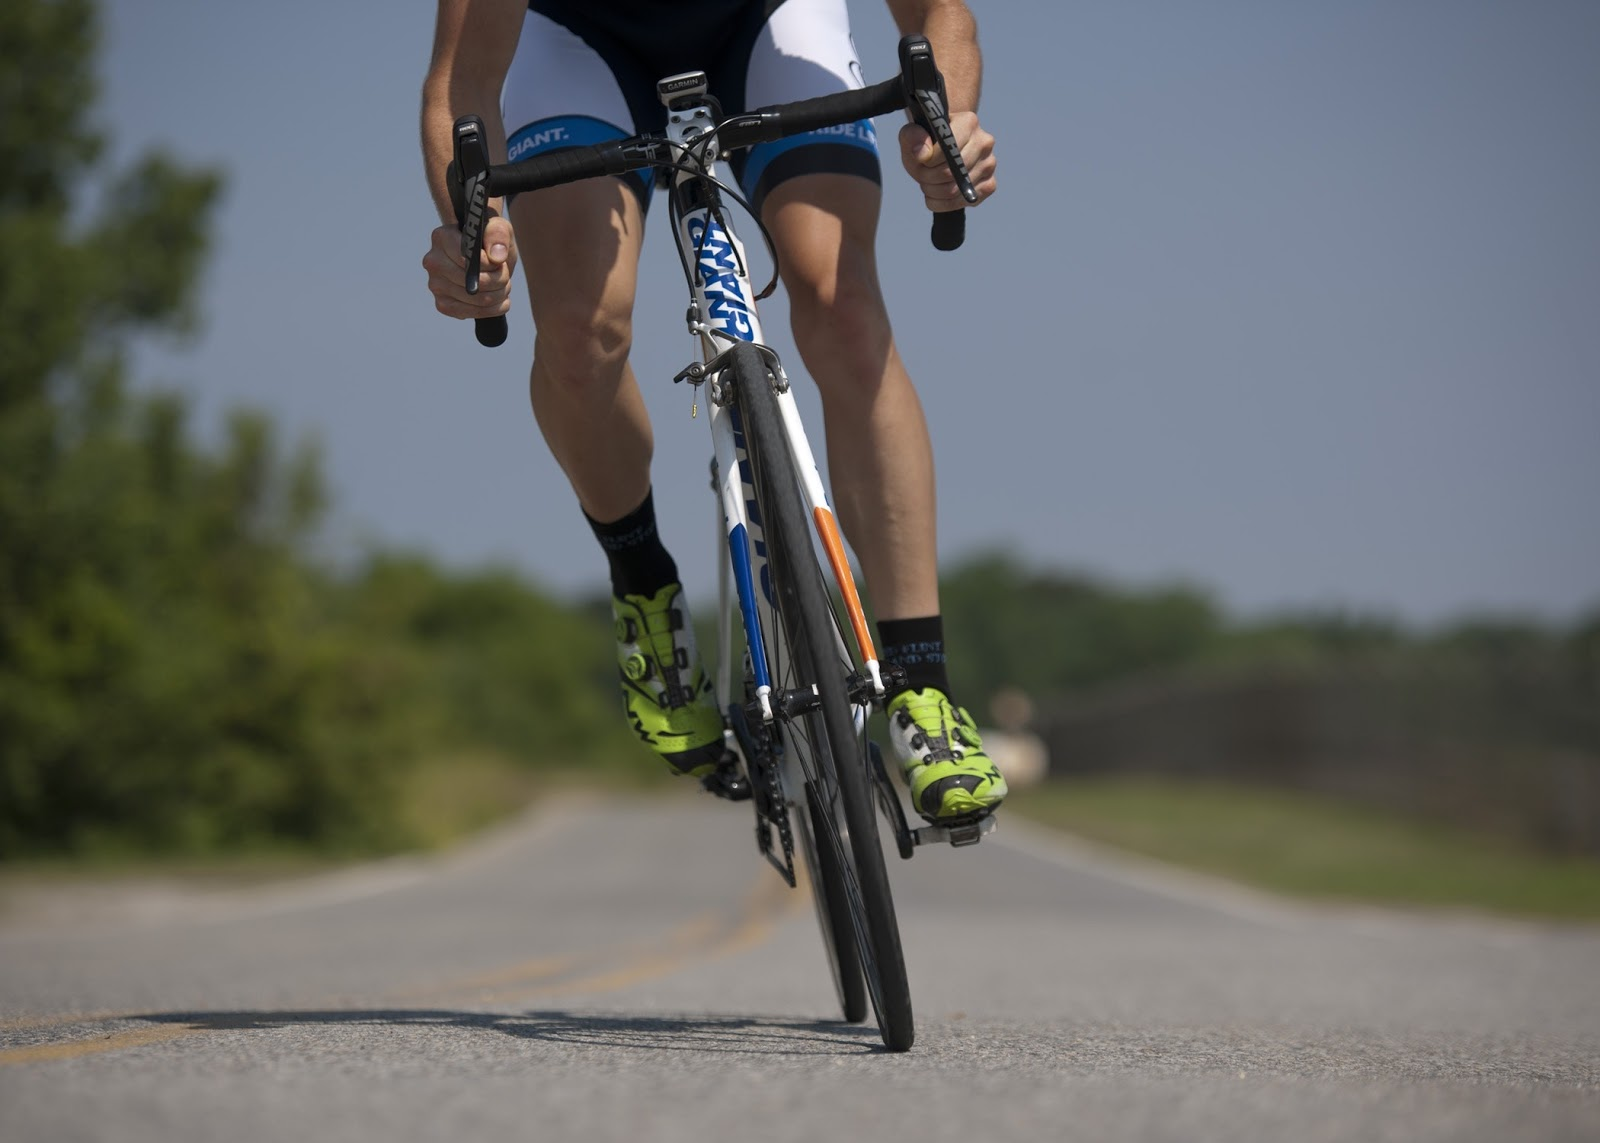 man biking down the road